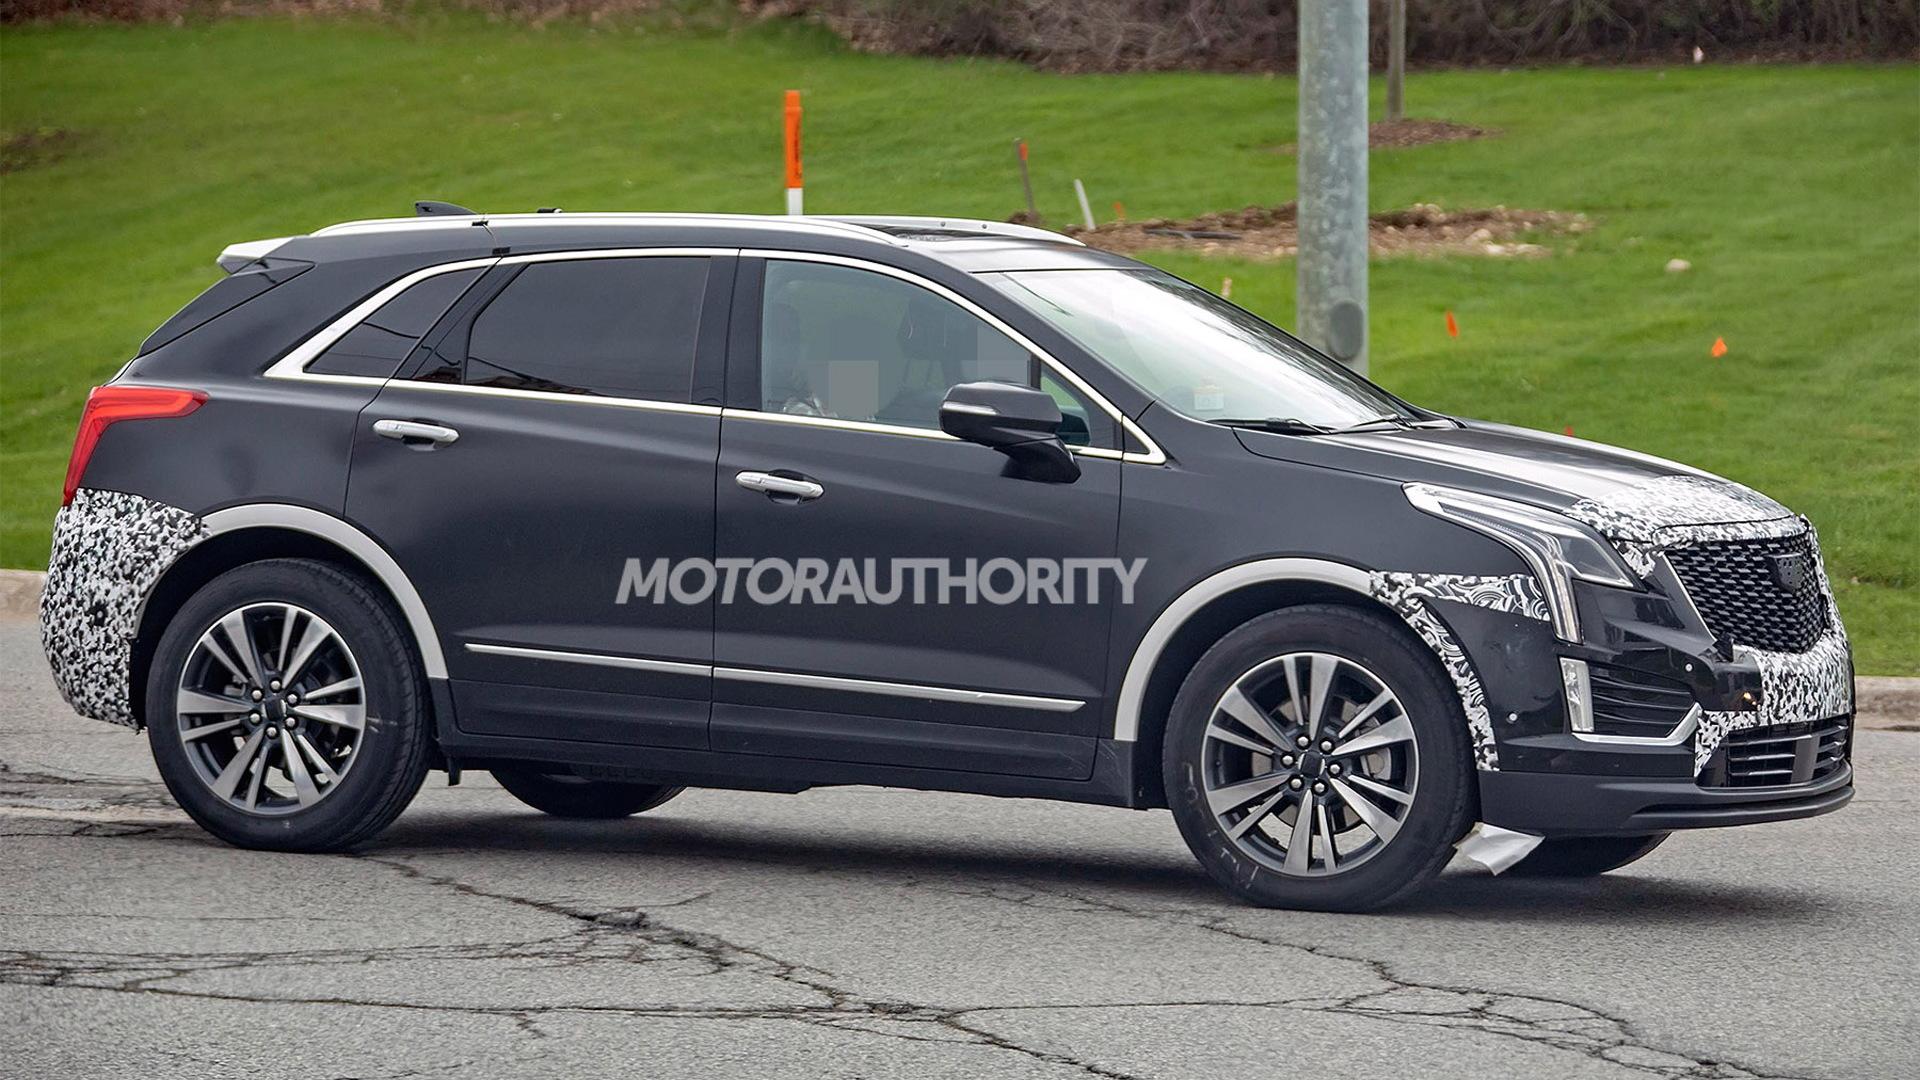 2020 Spy Shots Cadillac Xt5 Exterior